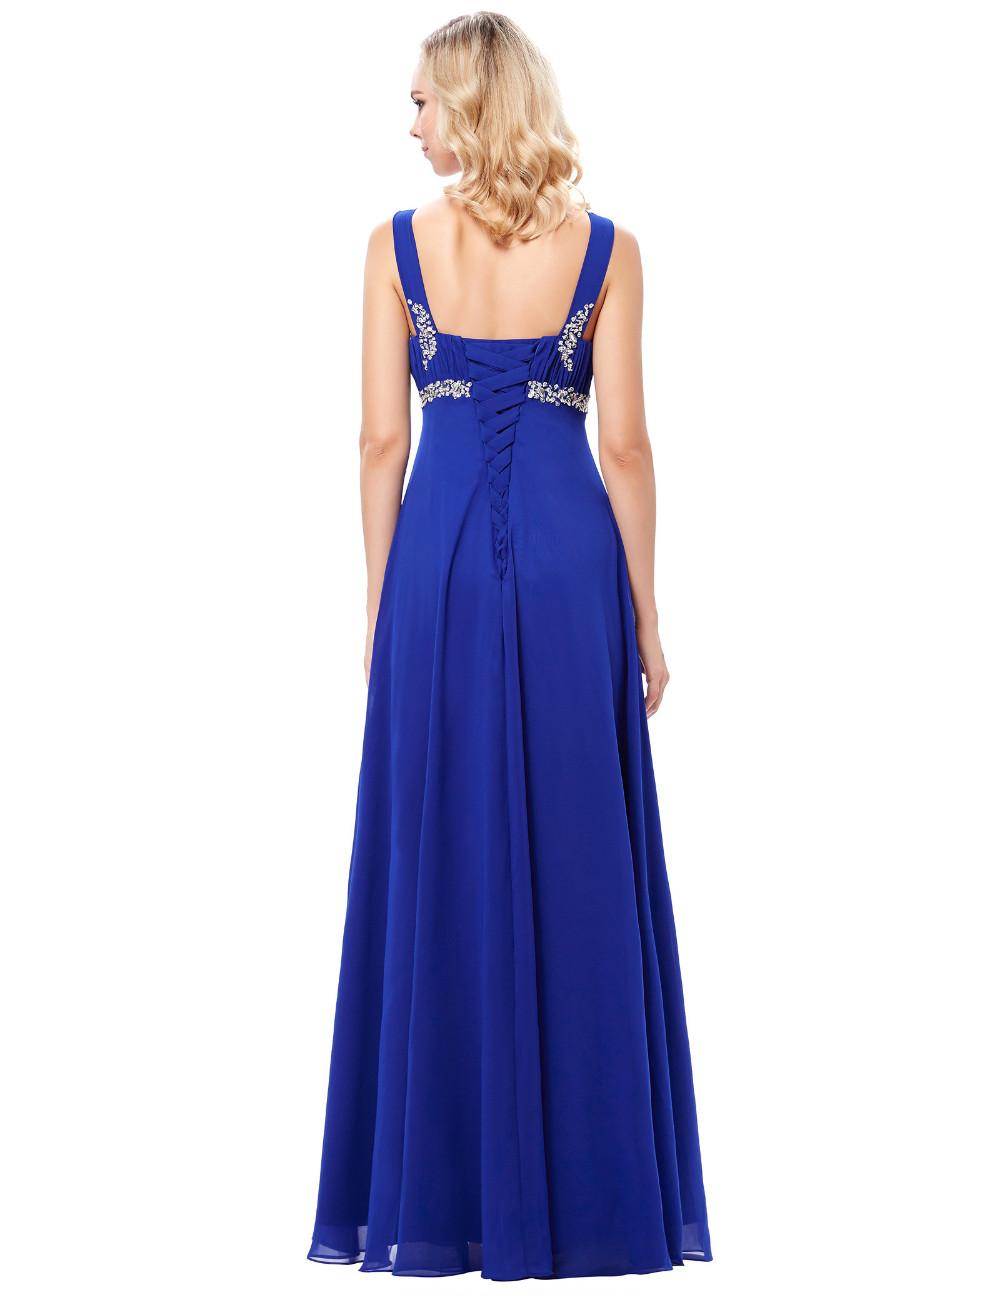 HTB1uEHVOFXXXXaqapXXq6xXFXXX2Long Formal Dress Elegant Floor Length Chiffon Dress